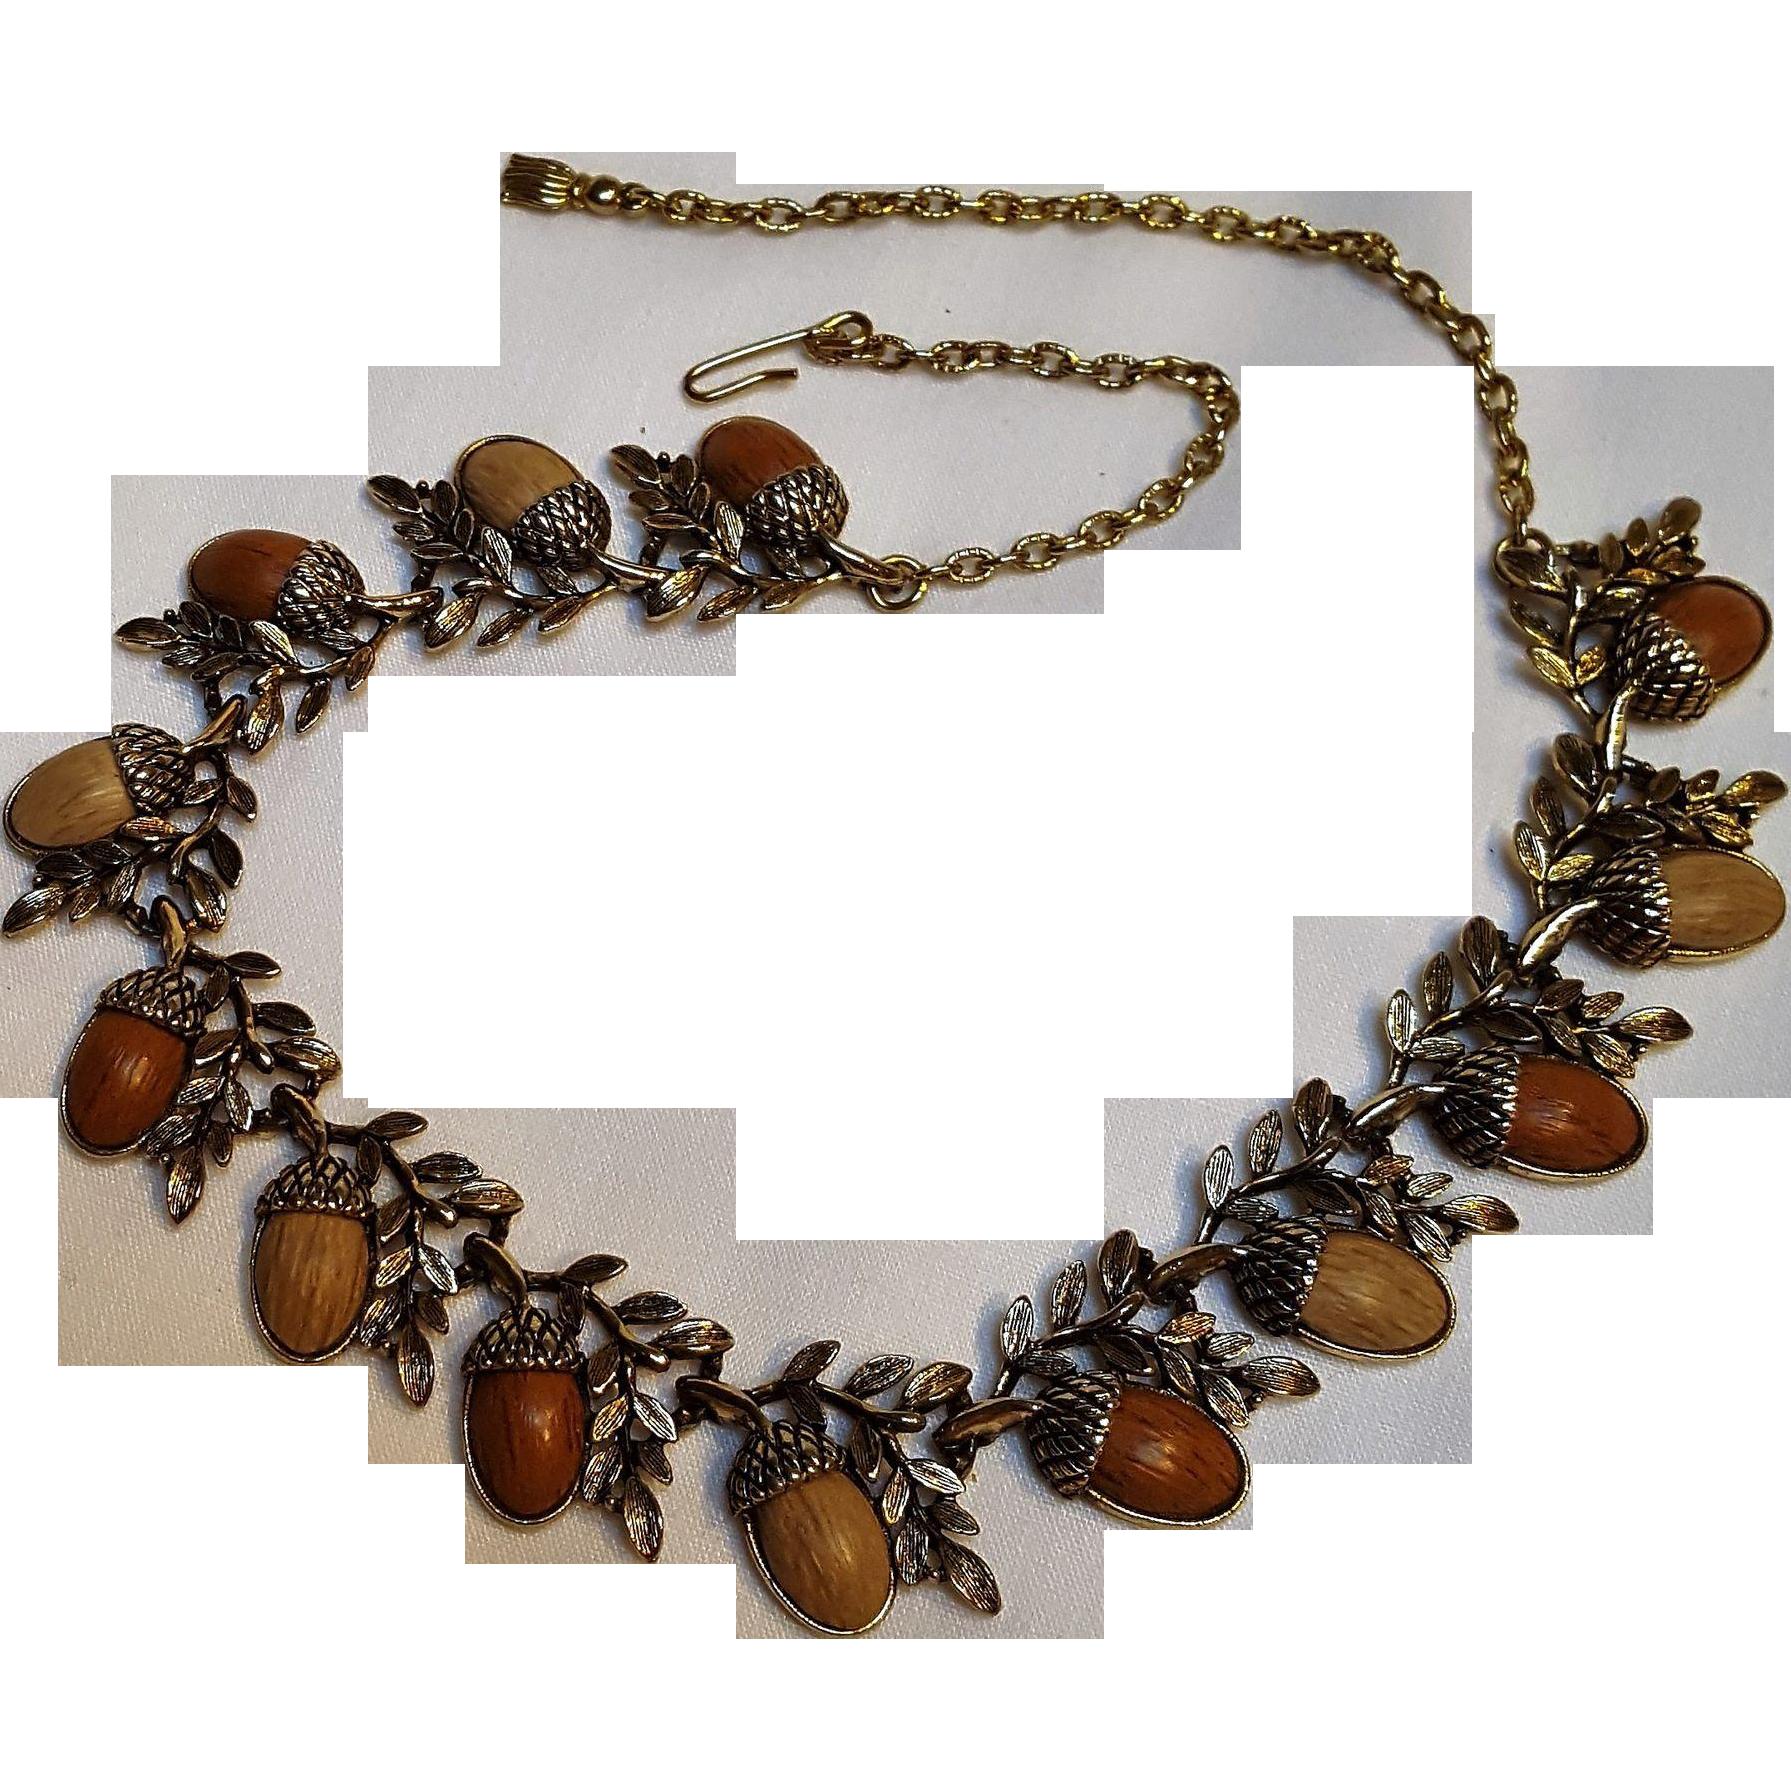 Acorn necklace Knotts berry farm by Coro